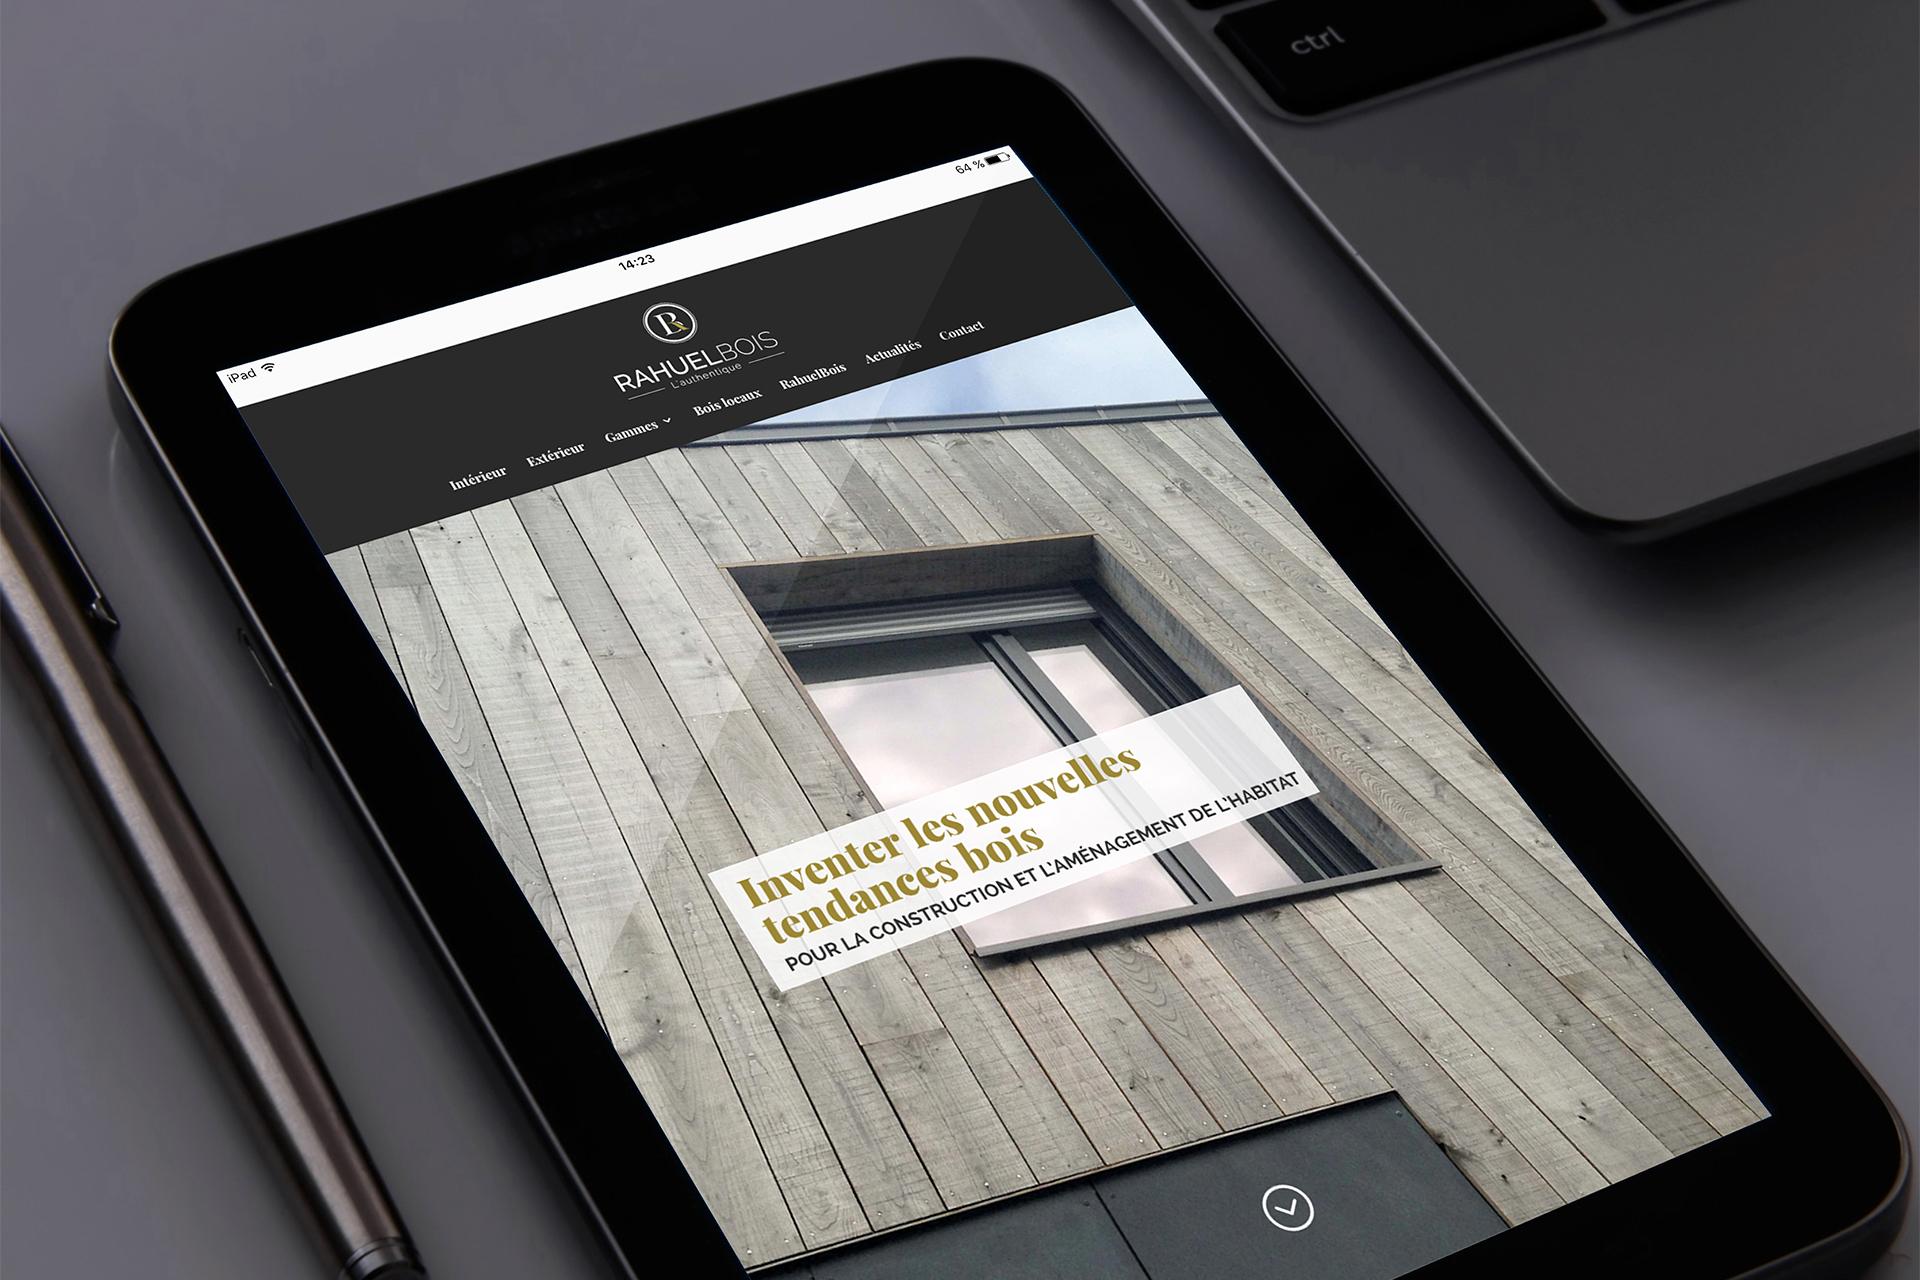 RAHEUL BOIS - refonte site internet